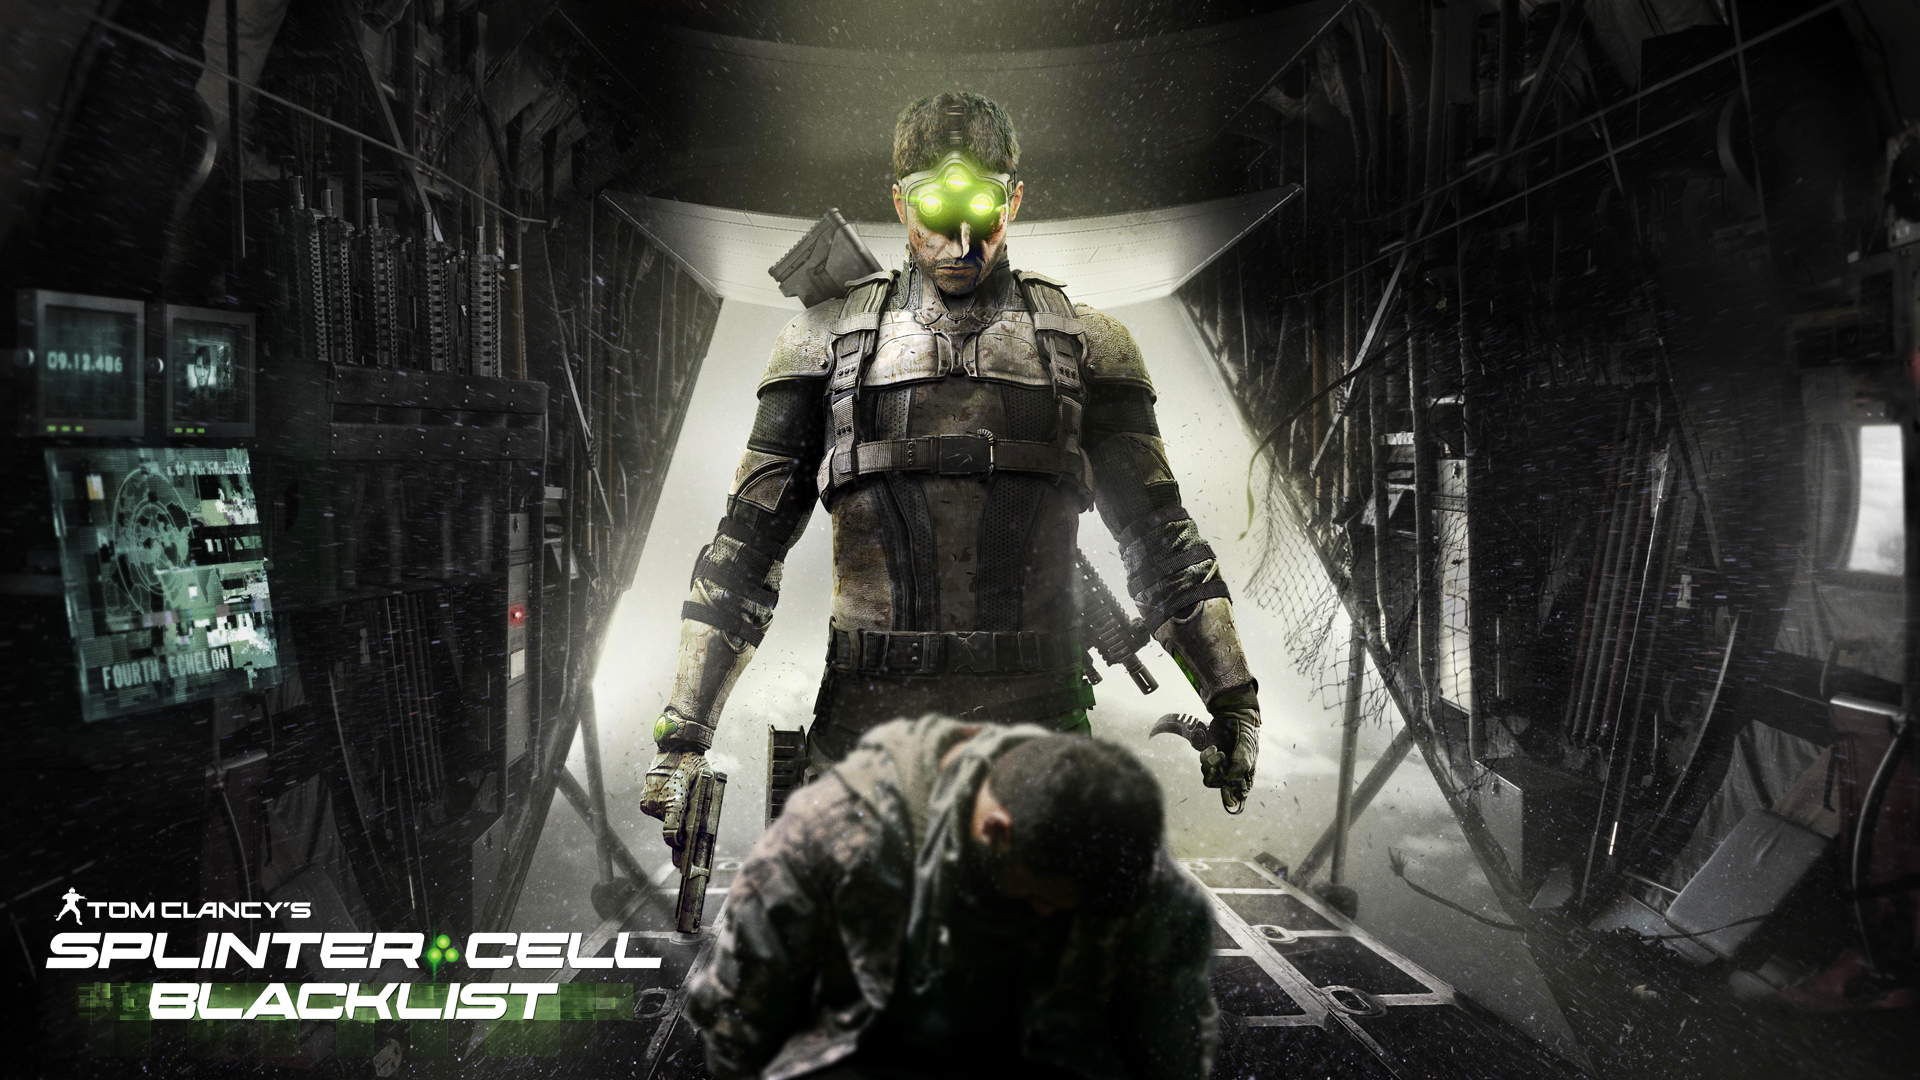 Download mobile wallpaper Splinter Cell, Games for free.